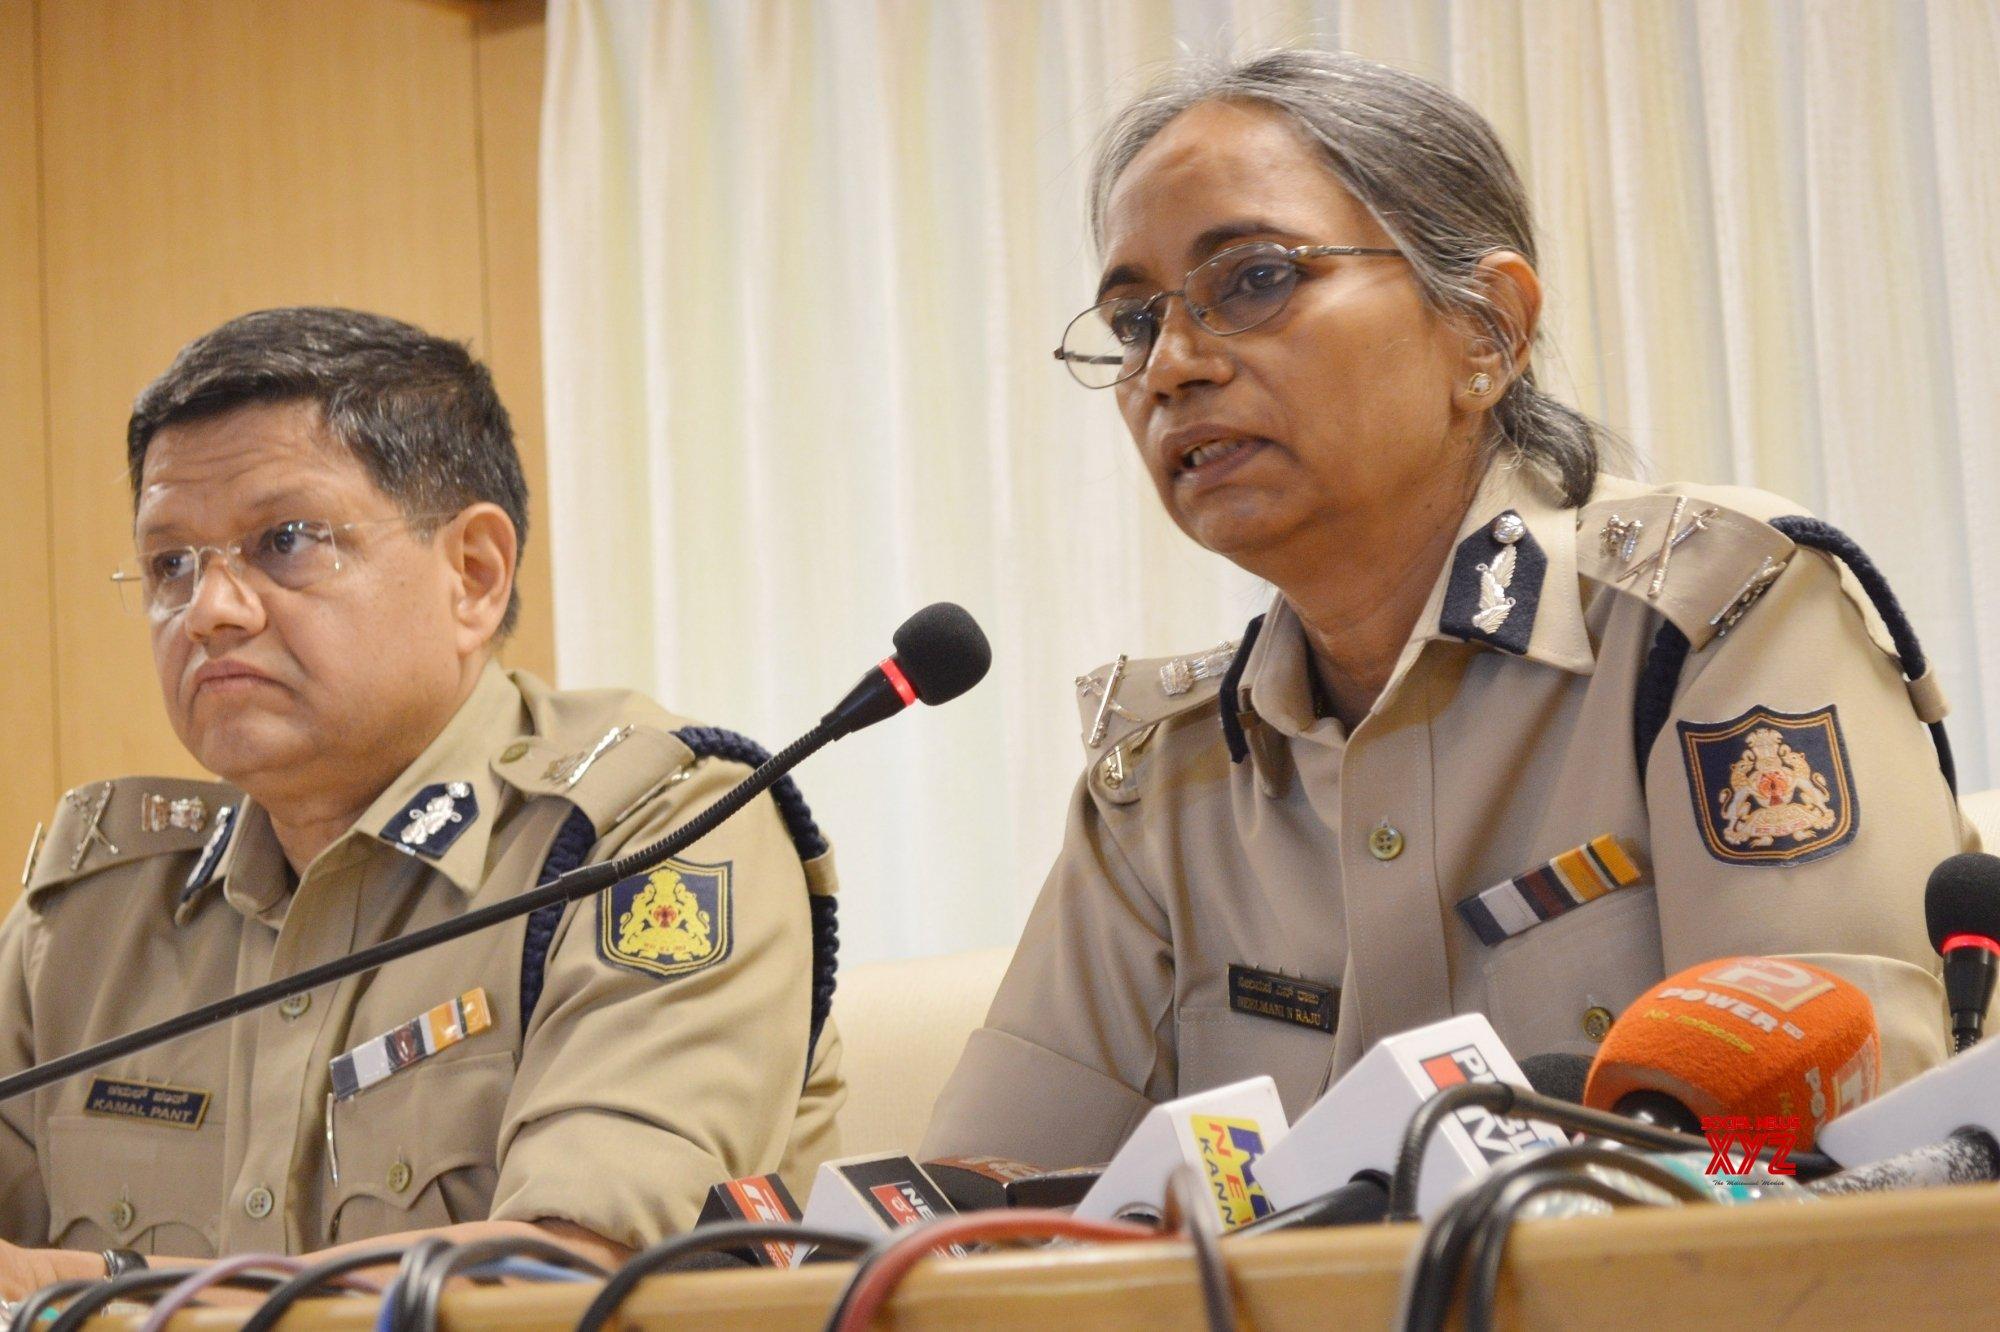 Bengaluru: Karnataka DGP - IGP Neelamani Raju's press conference #Gallery